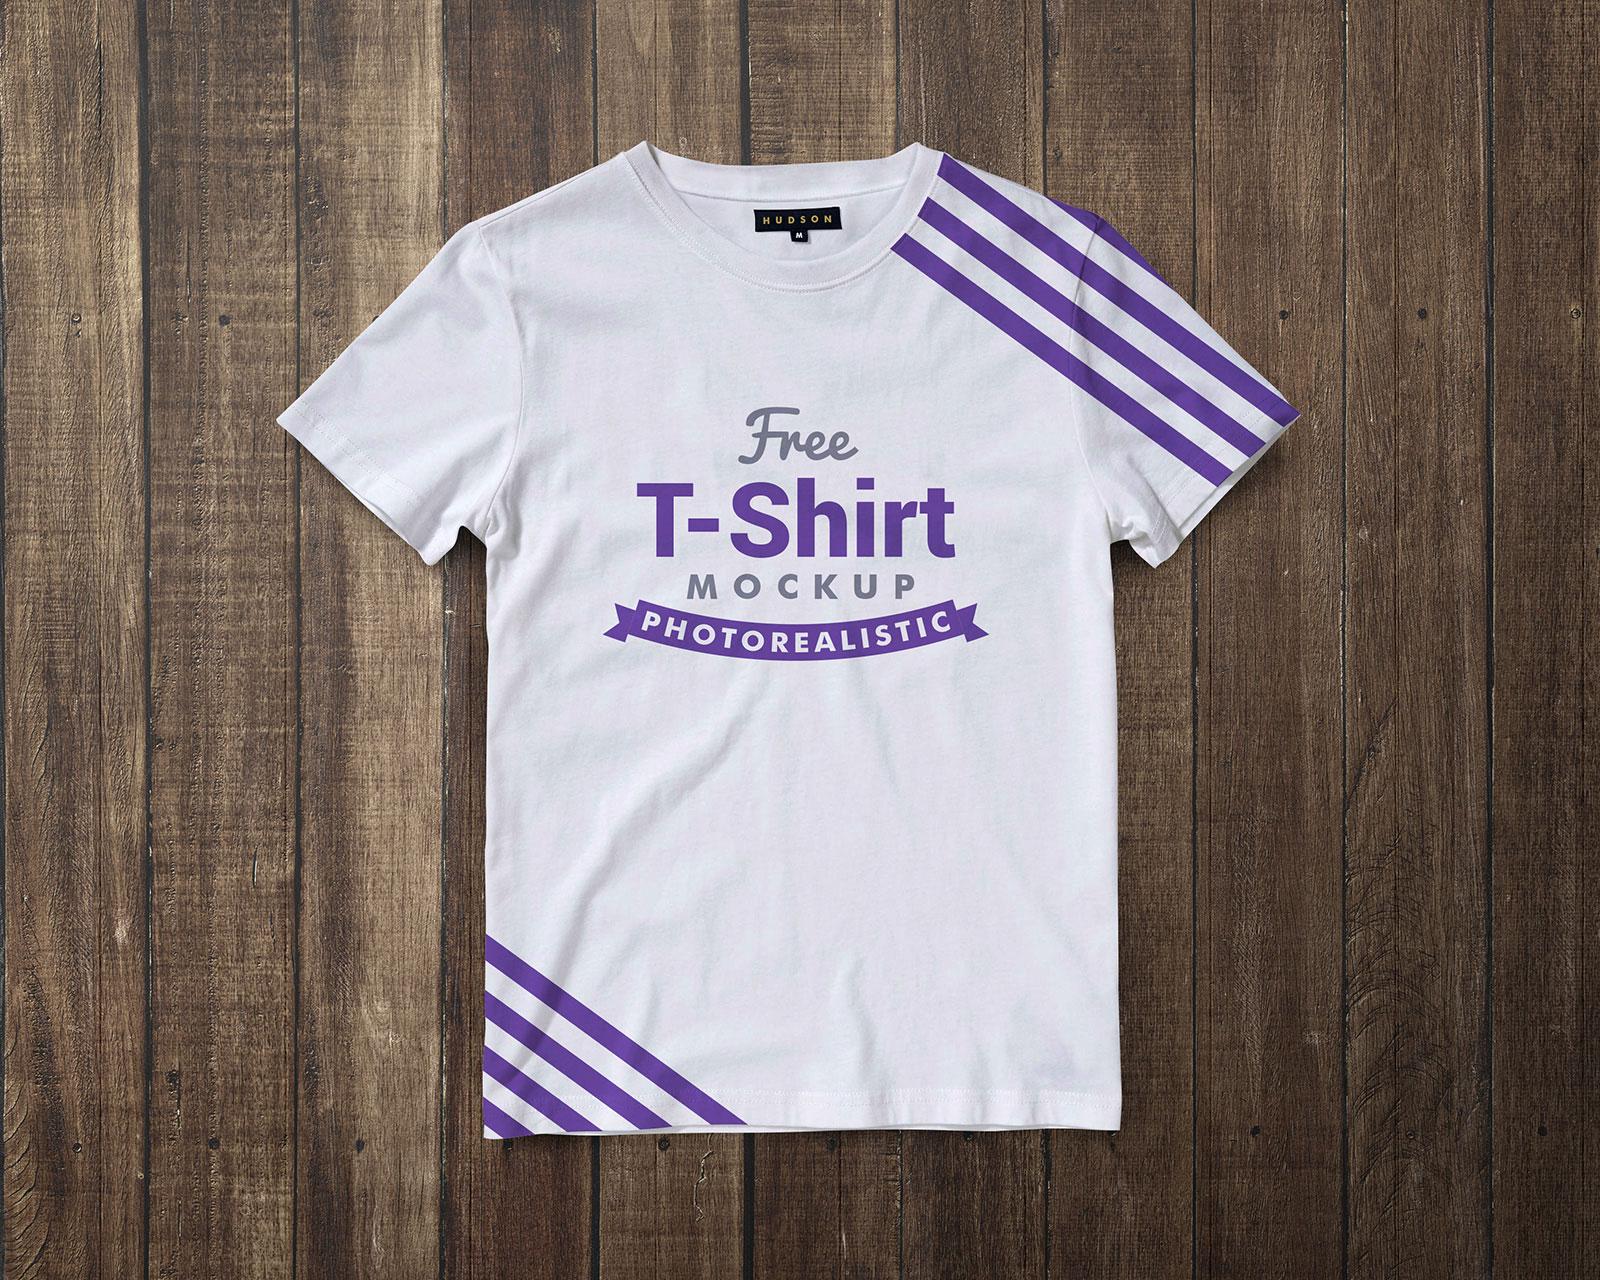 Free-Black-&-White-Half-Sleeves-T-Shirt-Mockup-PSD-5